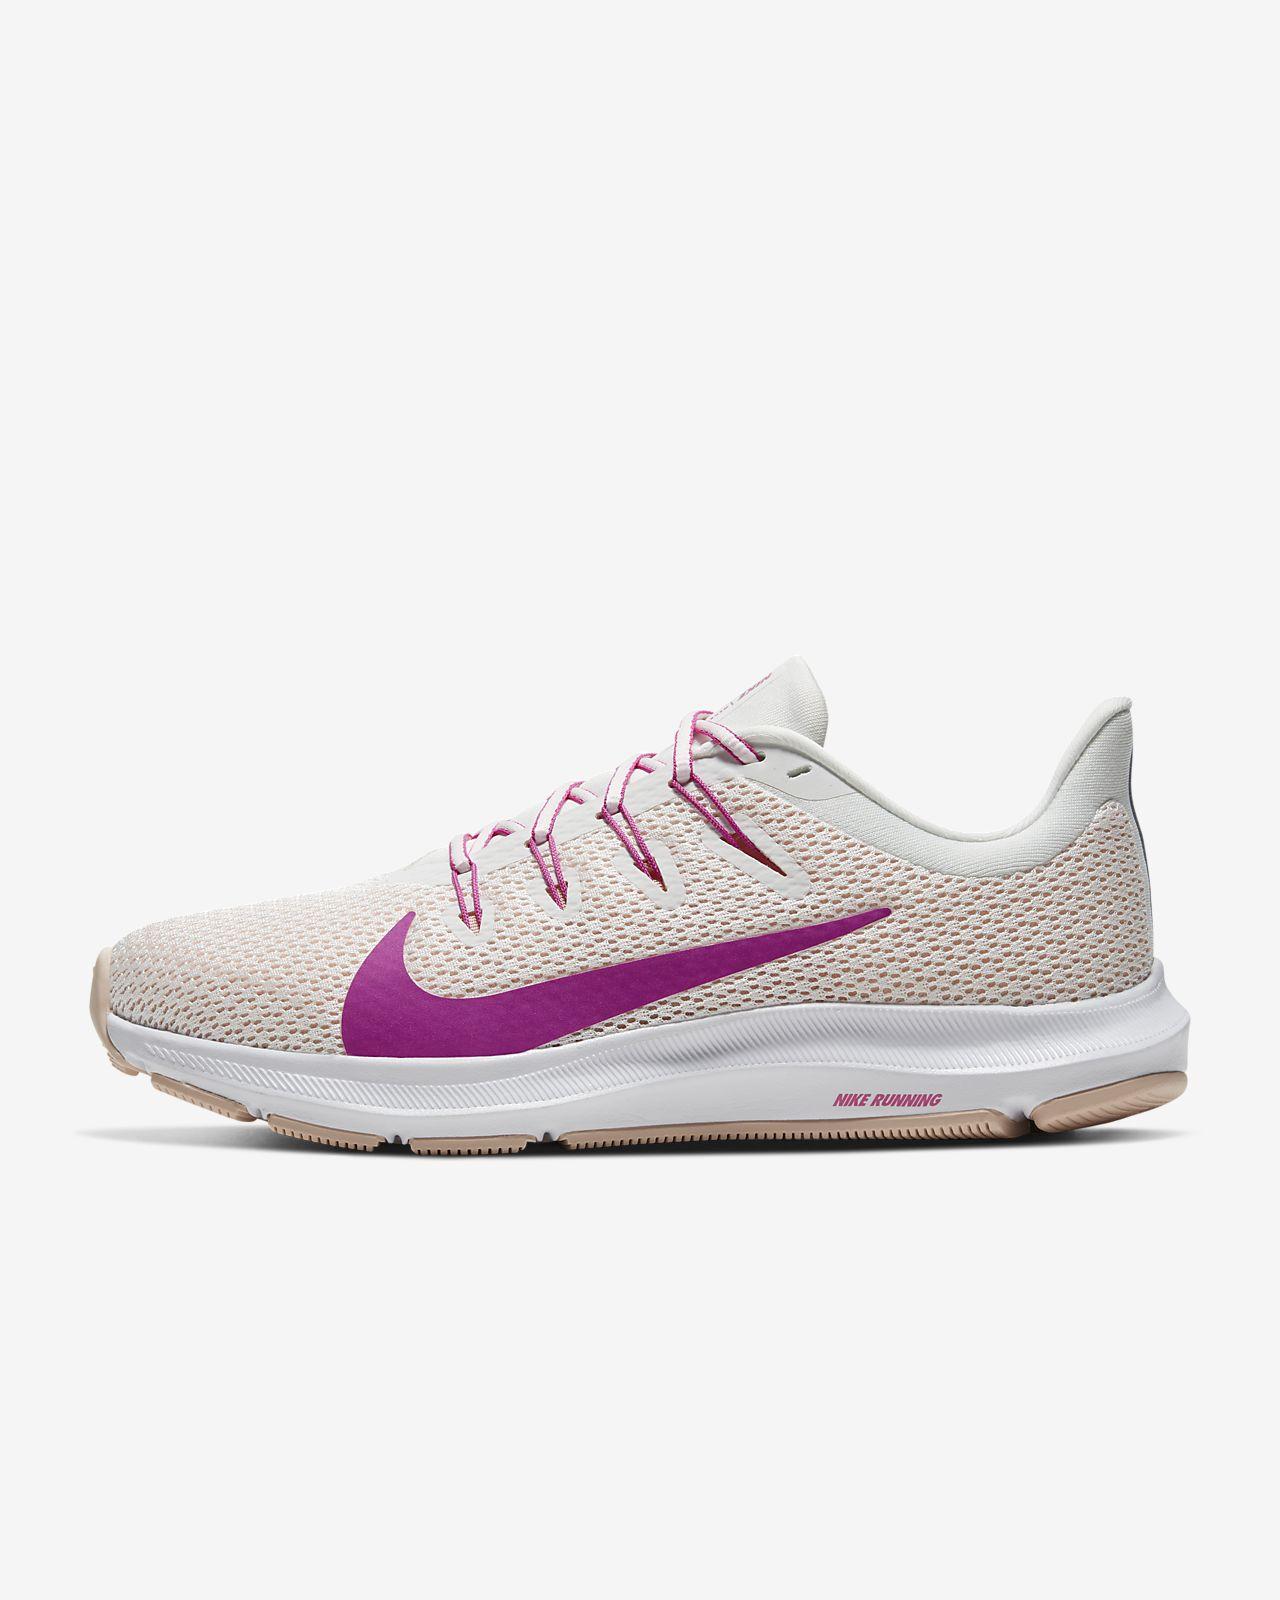 Sapatilhas de running Nike Quest 2 para mulher